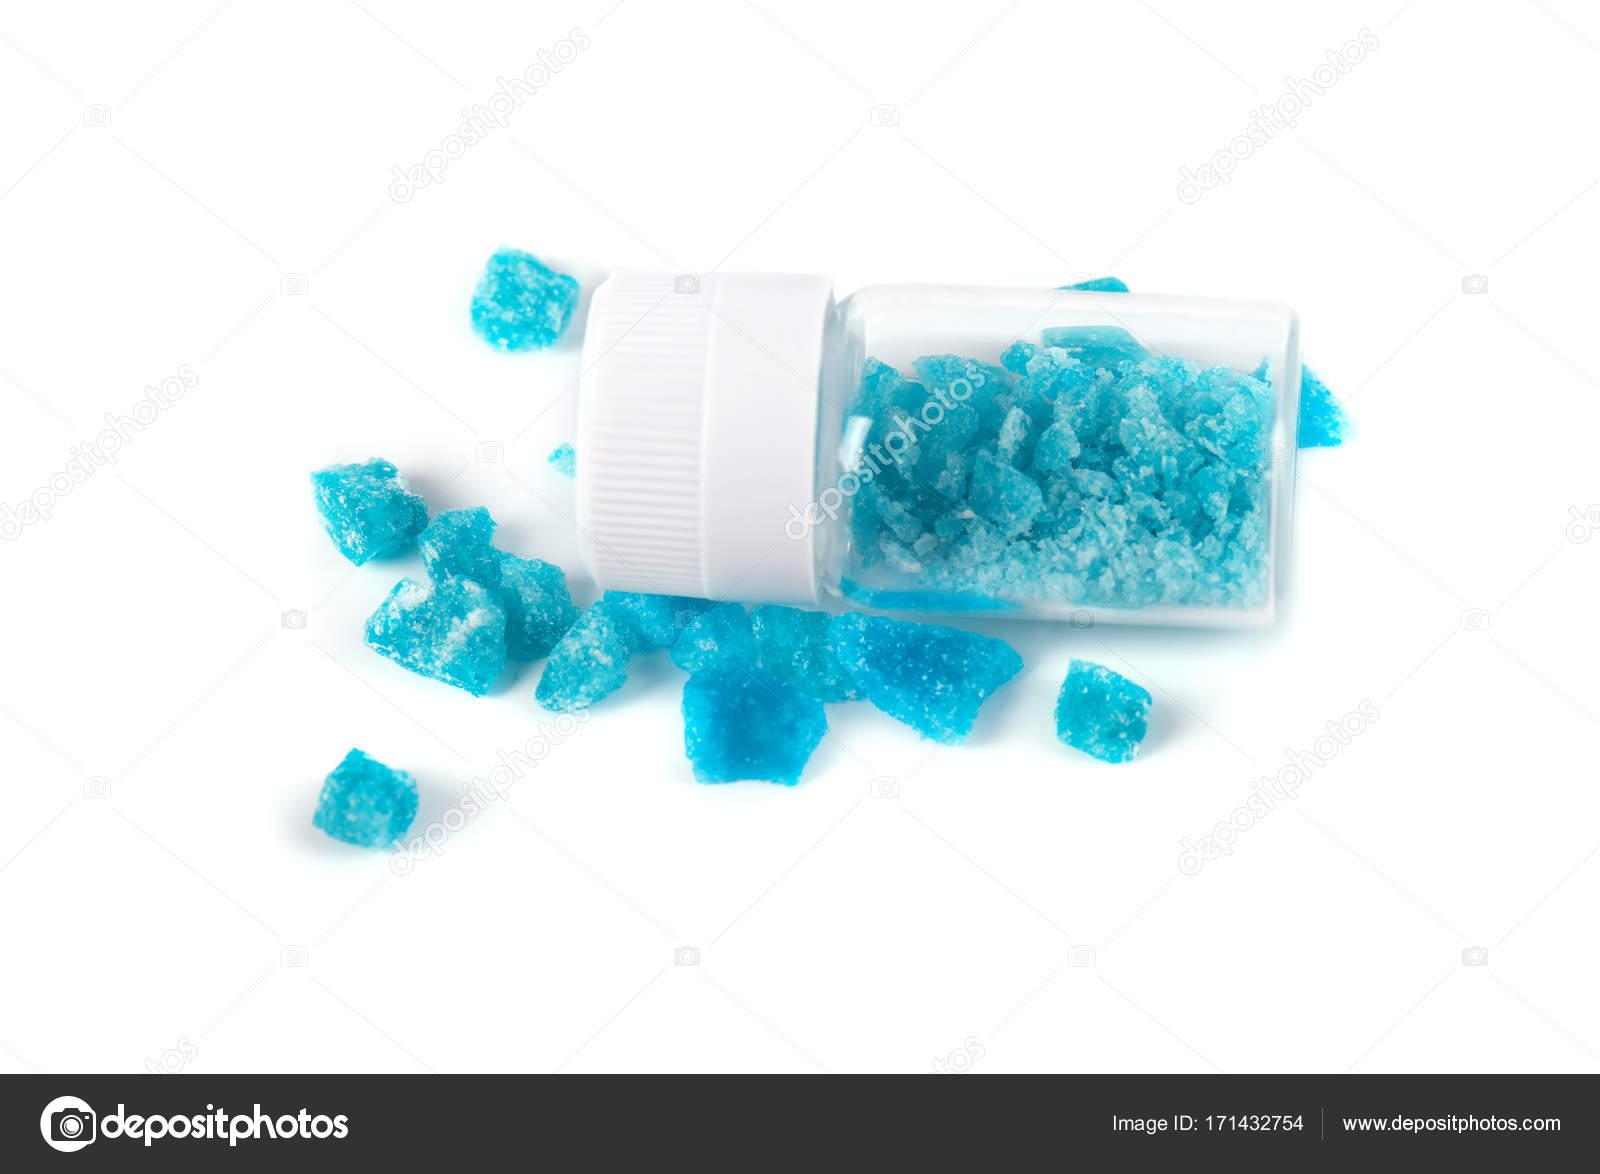 https://st3.depositphotos.com/3692943/17143/i/1600/depositphotos_171432754-stock-photo-blue-crystal-of-methamphetamine-isolated.jpg